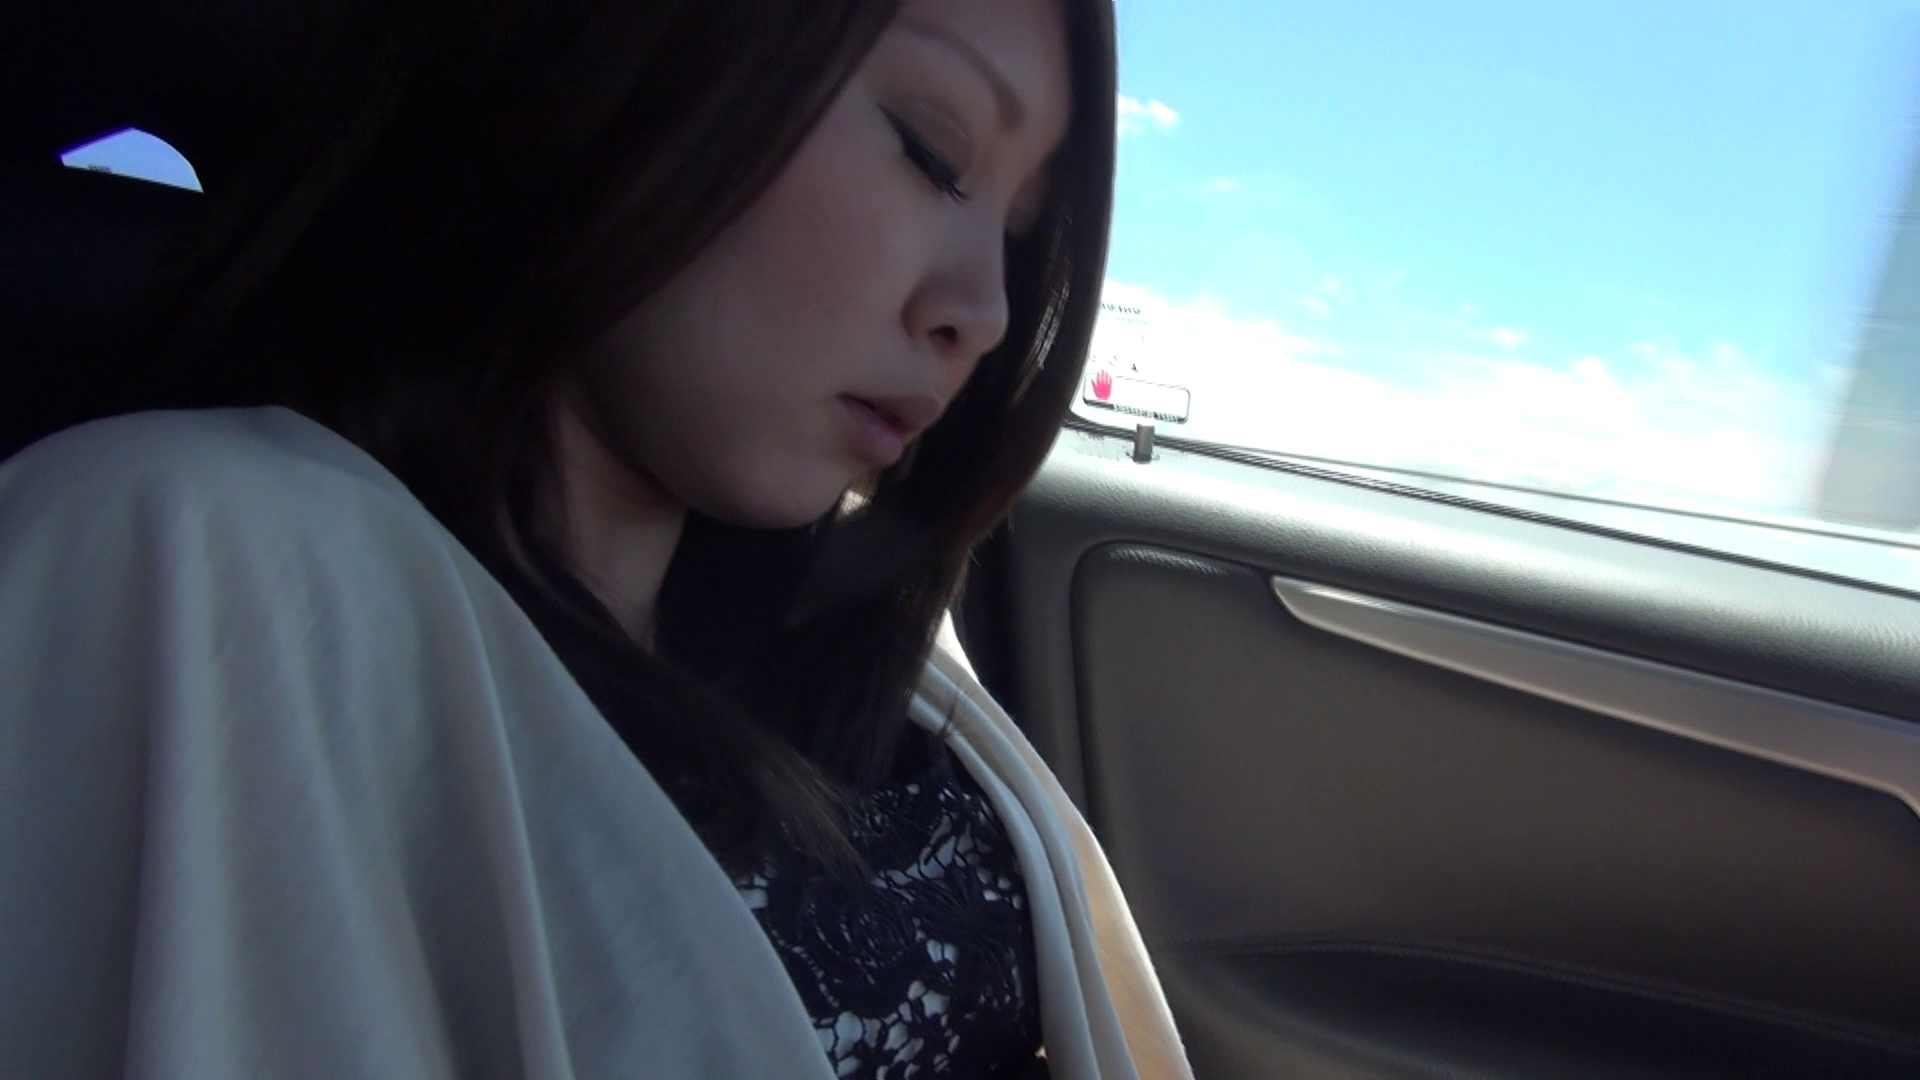 episode6 ドライブ中に・・・妻に強せいオナニー オナニー  106pic 34